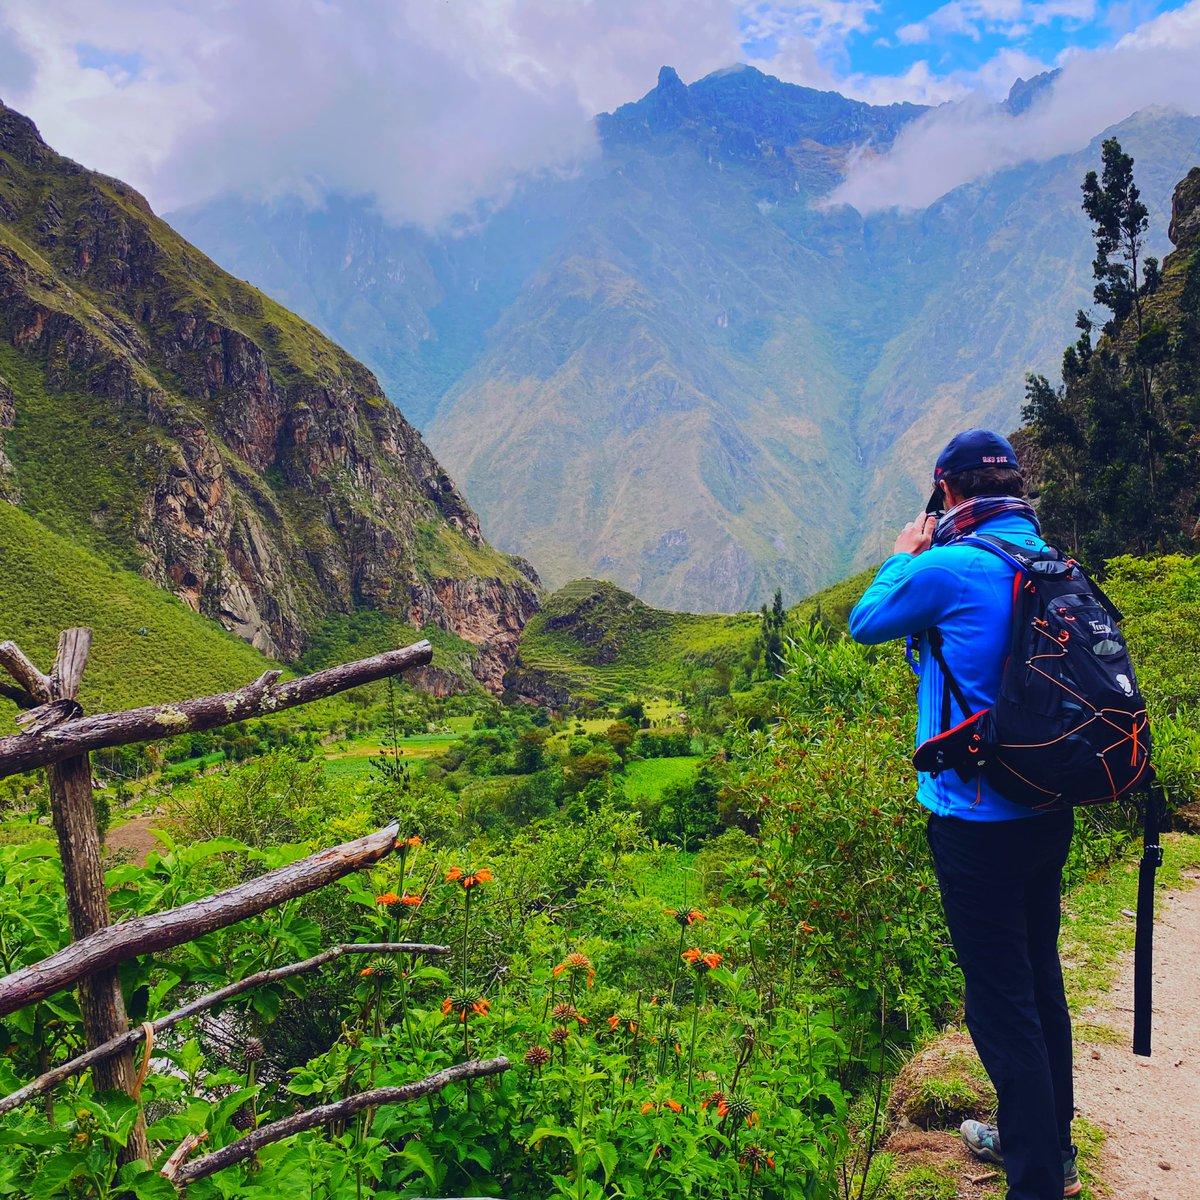 Classic Inca Trail 4D/3N to #Machupicchu !!! #travelphotography #naturephotography #trip #travelblogger #naturelovers #ctperu #nature_perfection #trekking #hike #cusco #wonderlust #america #mountains #explore #love #lonelyplanet #natgeo #discovery #lifestyle #stayhome #Perú #daypic.twitter.com/sVW5MNEuCV